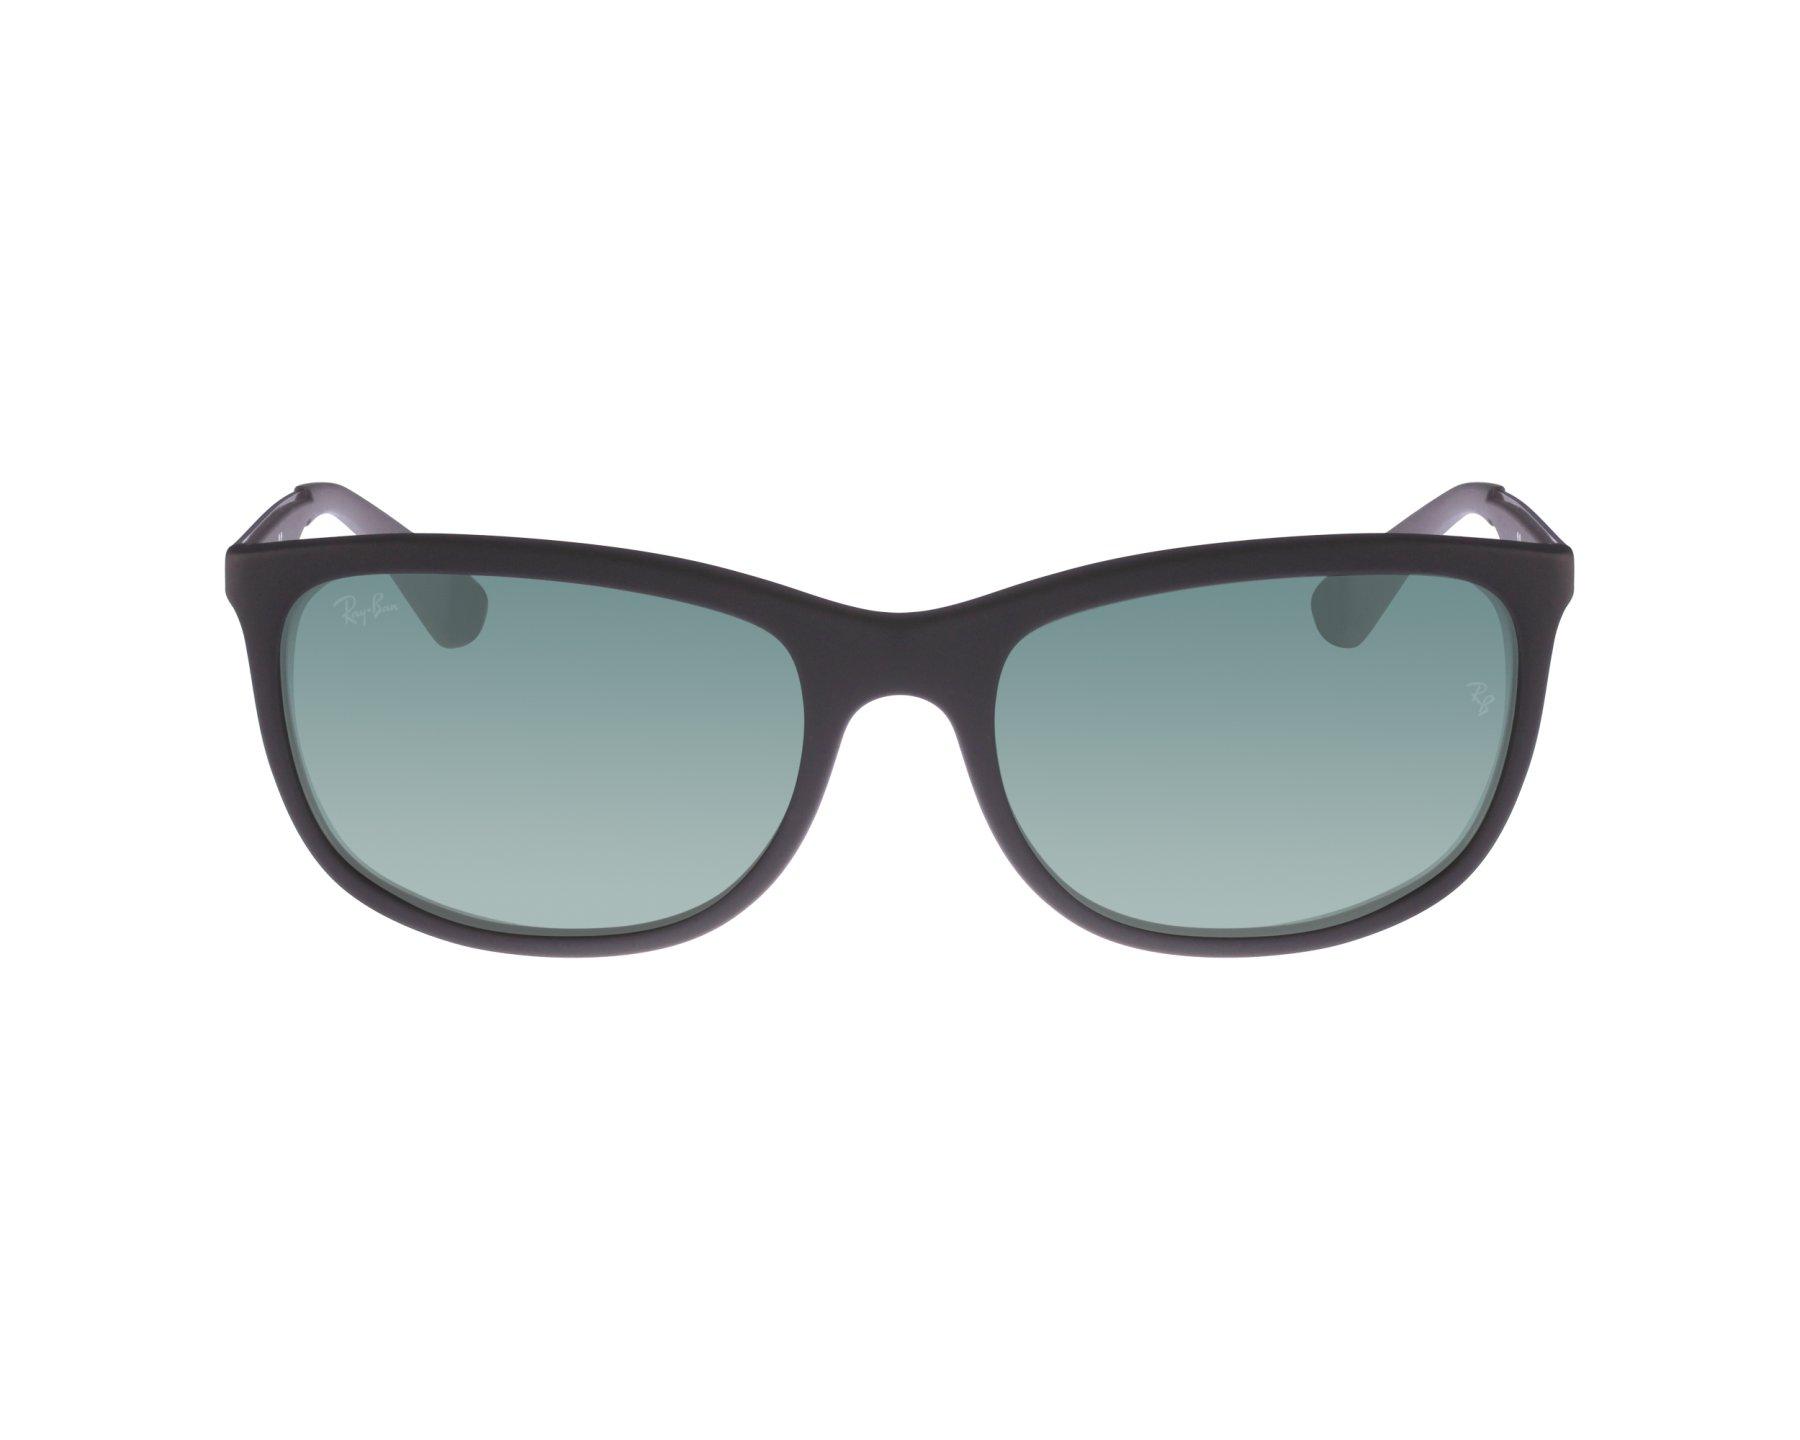 bd24c6f3cb9 Sunglasses Ray-Ban RB-4267 601S 71 59-19 Black Grey profile